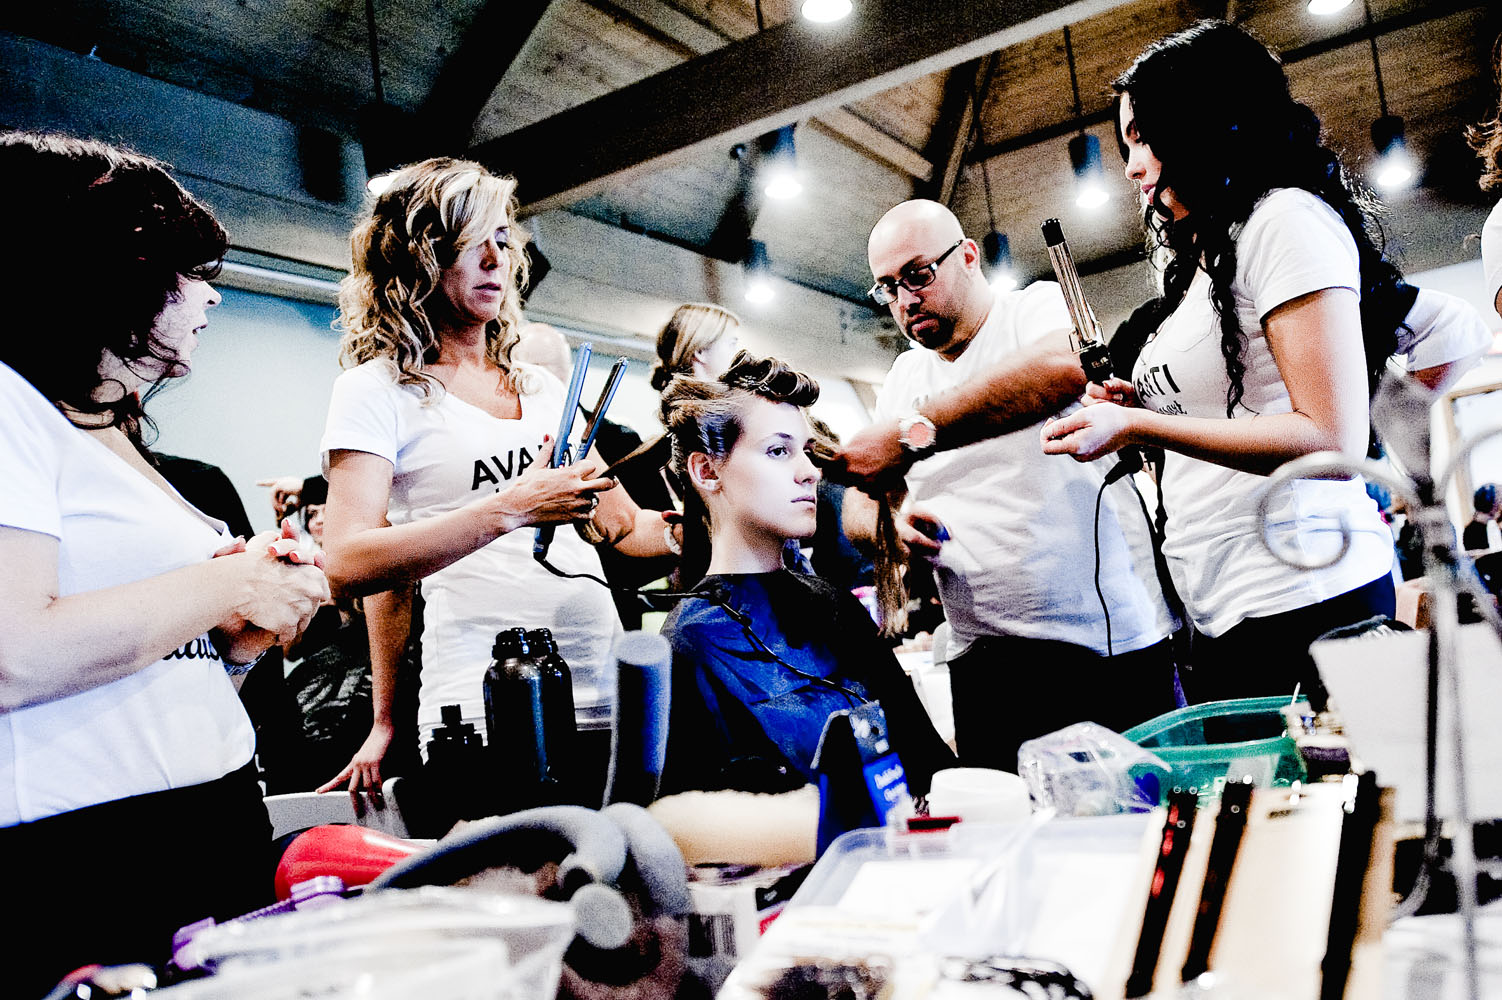 Bangz salon wellness spa montclair nj 2015 personal blog for 3d nail art salon new jersey